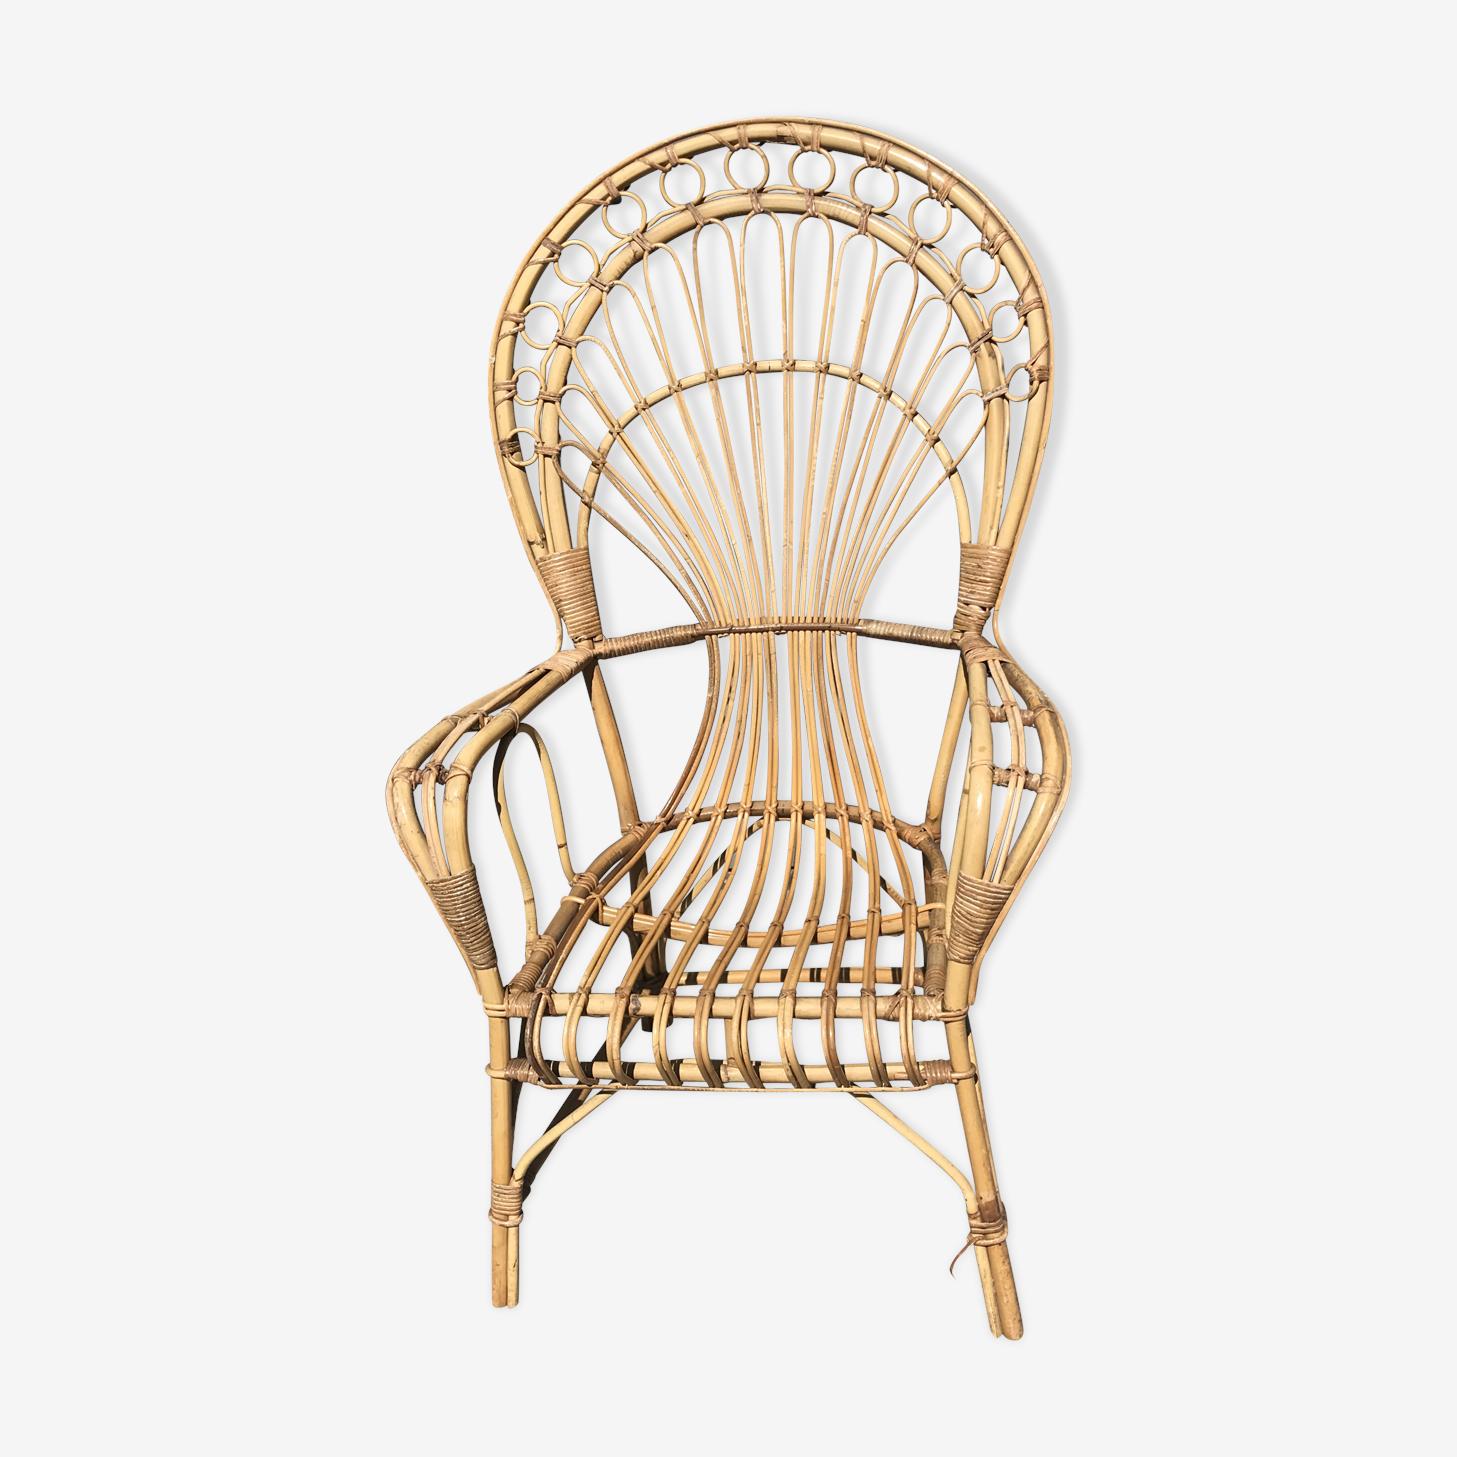 Vintage wicker rattan armchair